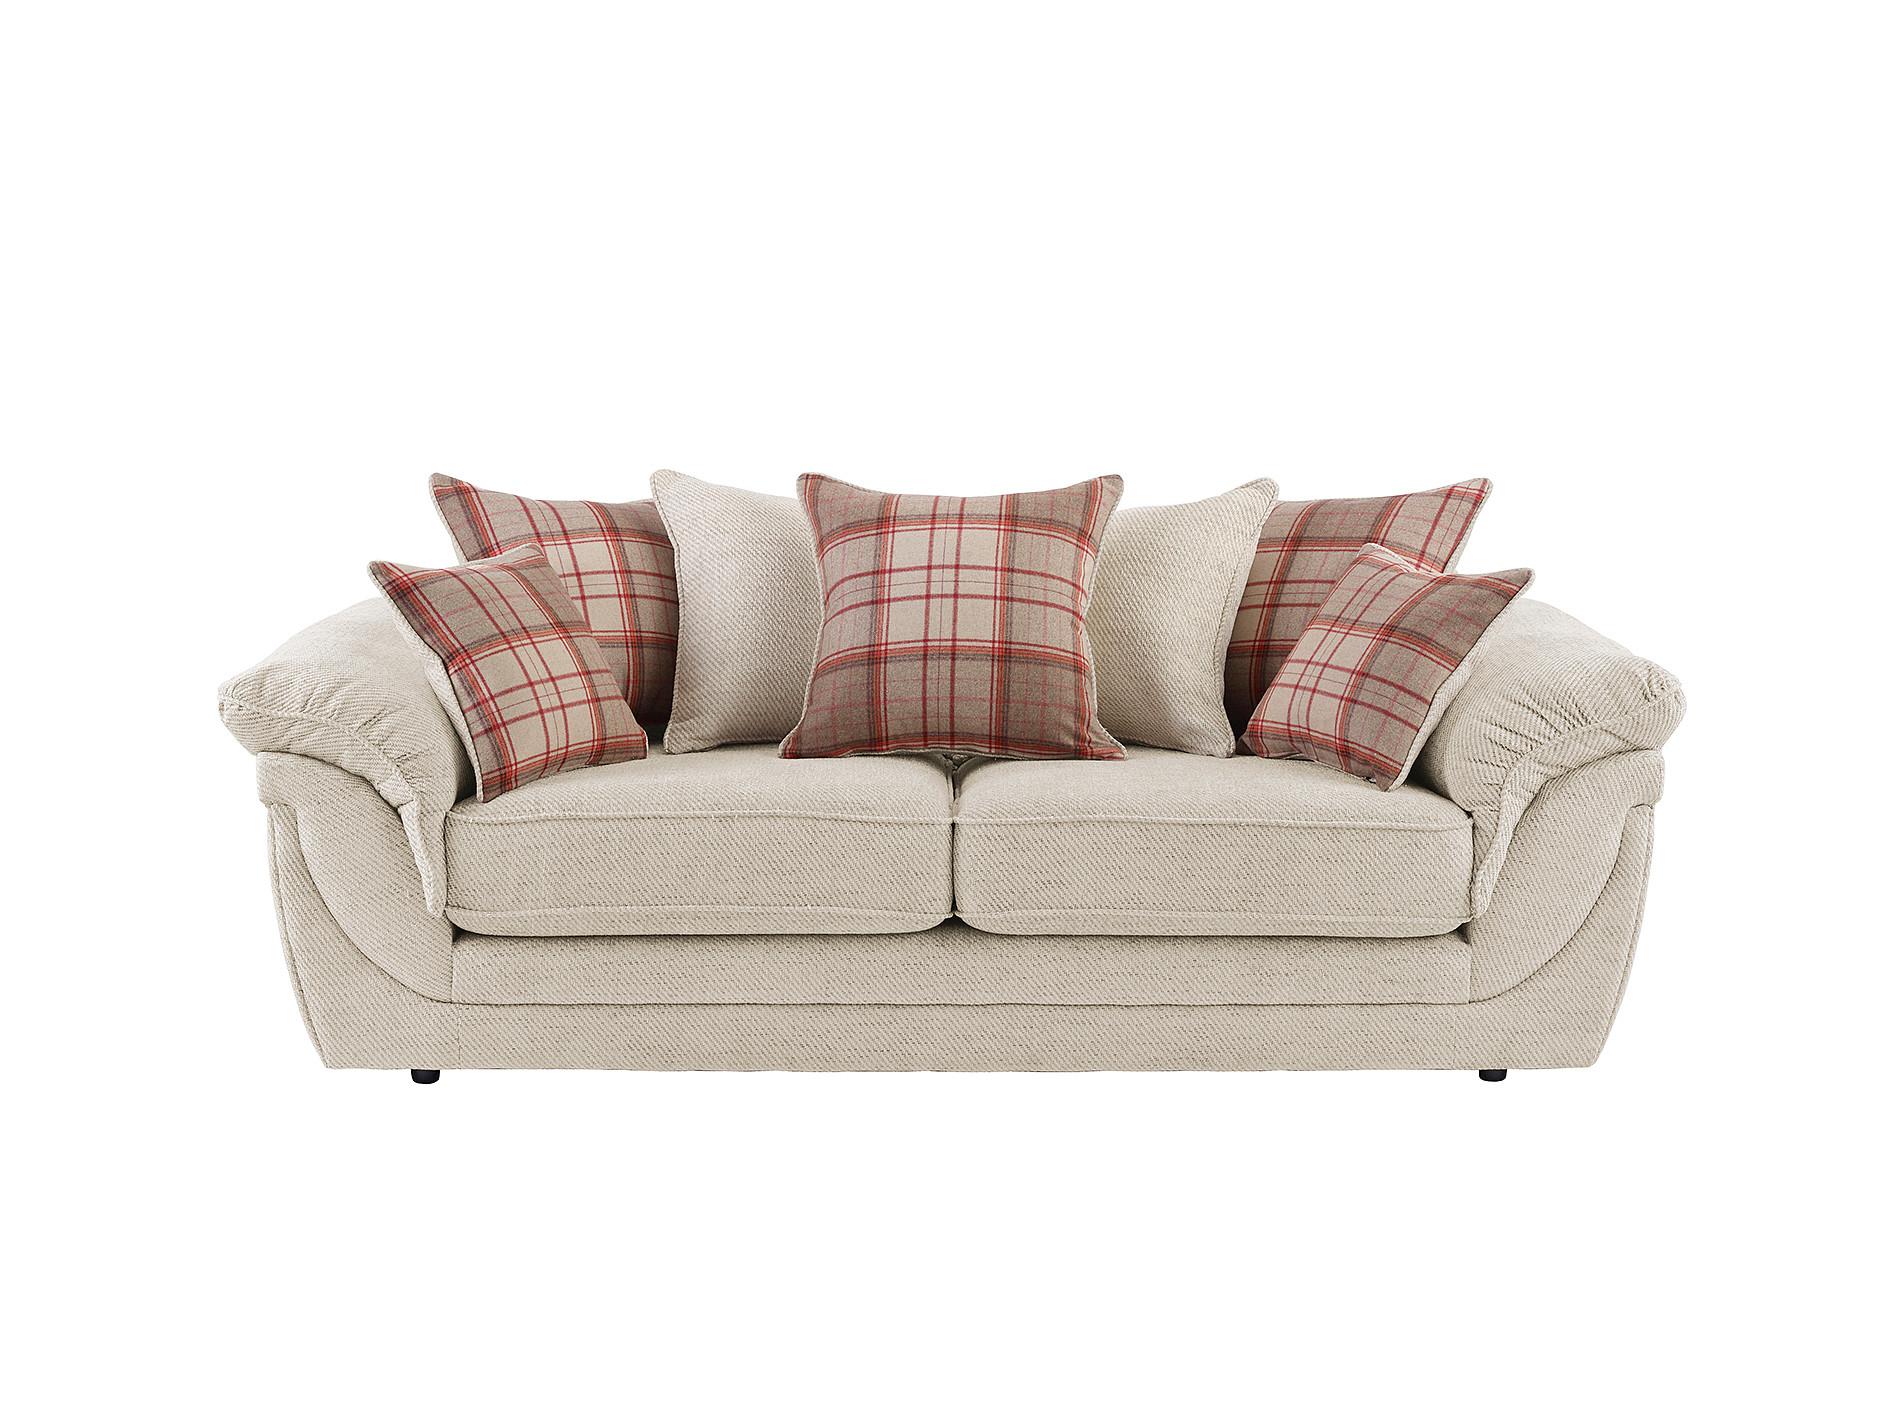 SofaStorecom  Quality Sofas At Incredible Prices